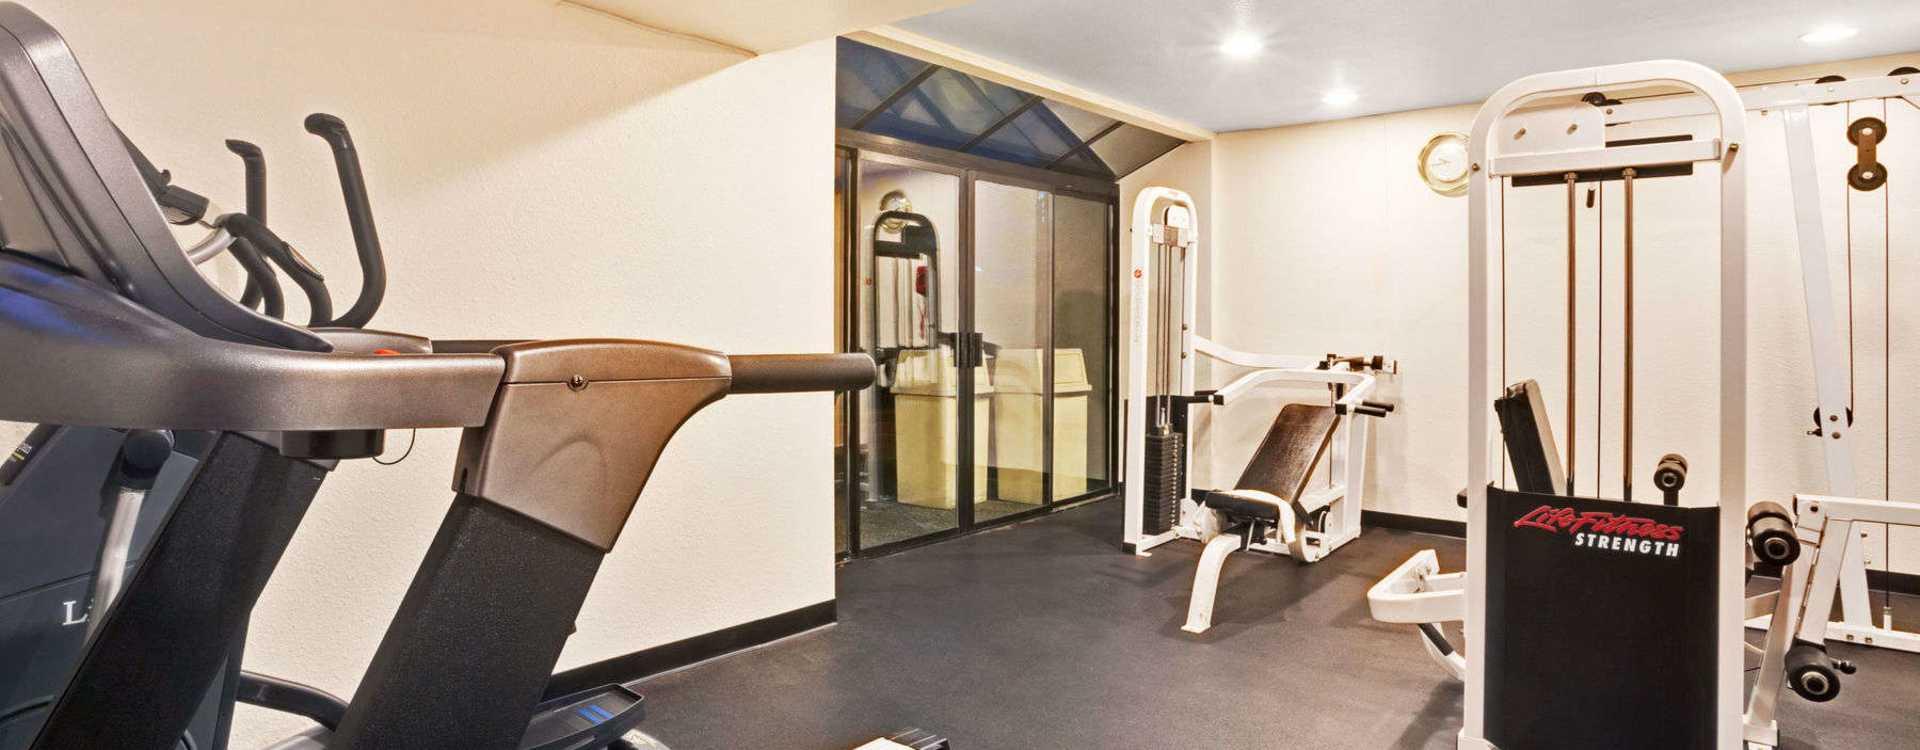 Health Club & Fitness Center